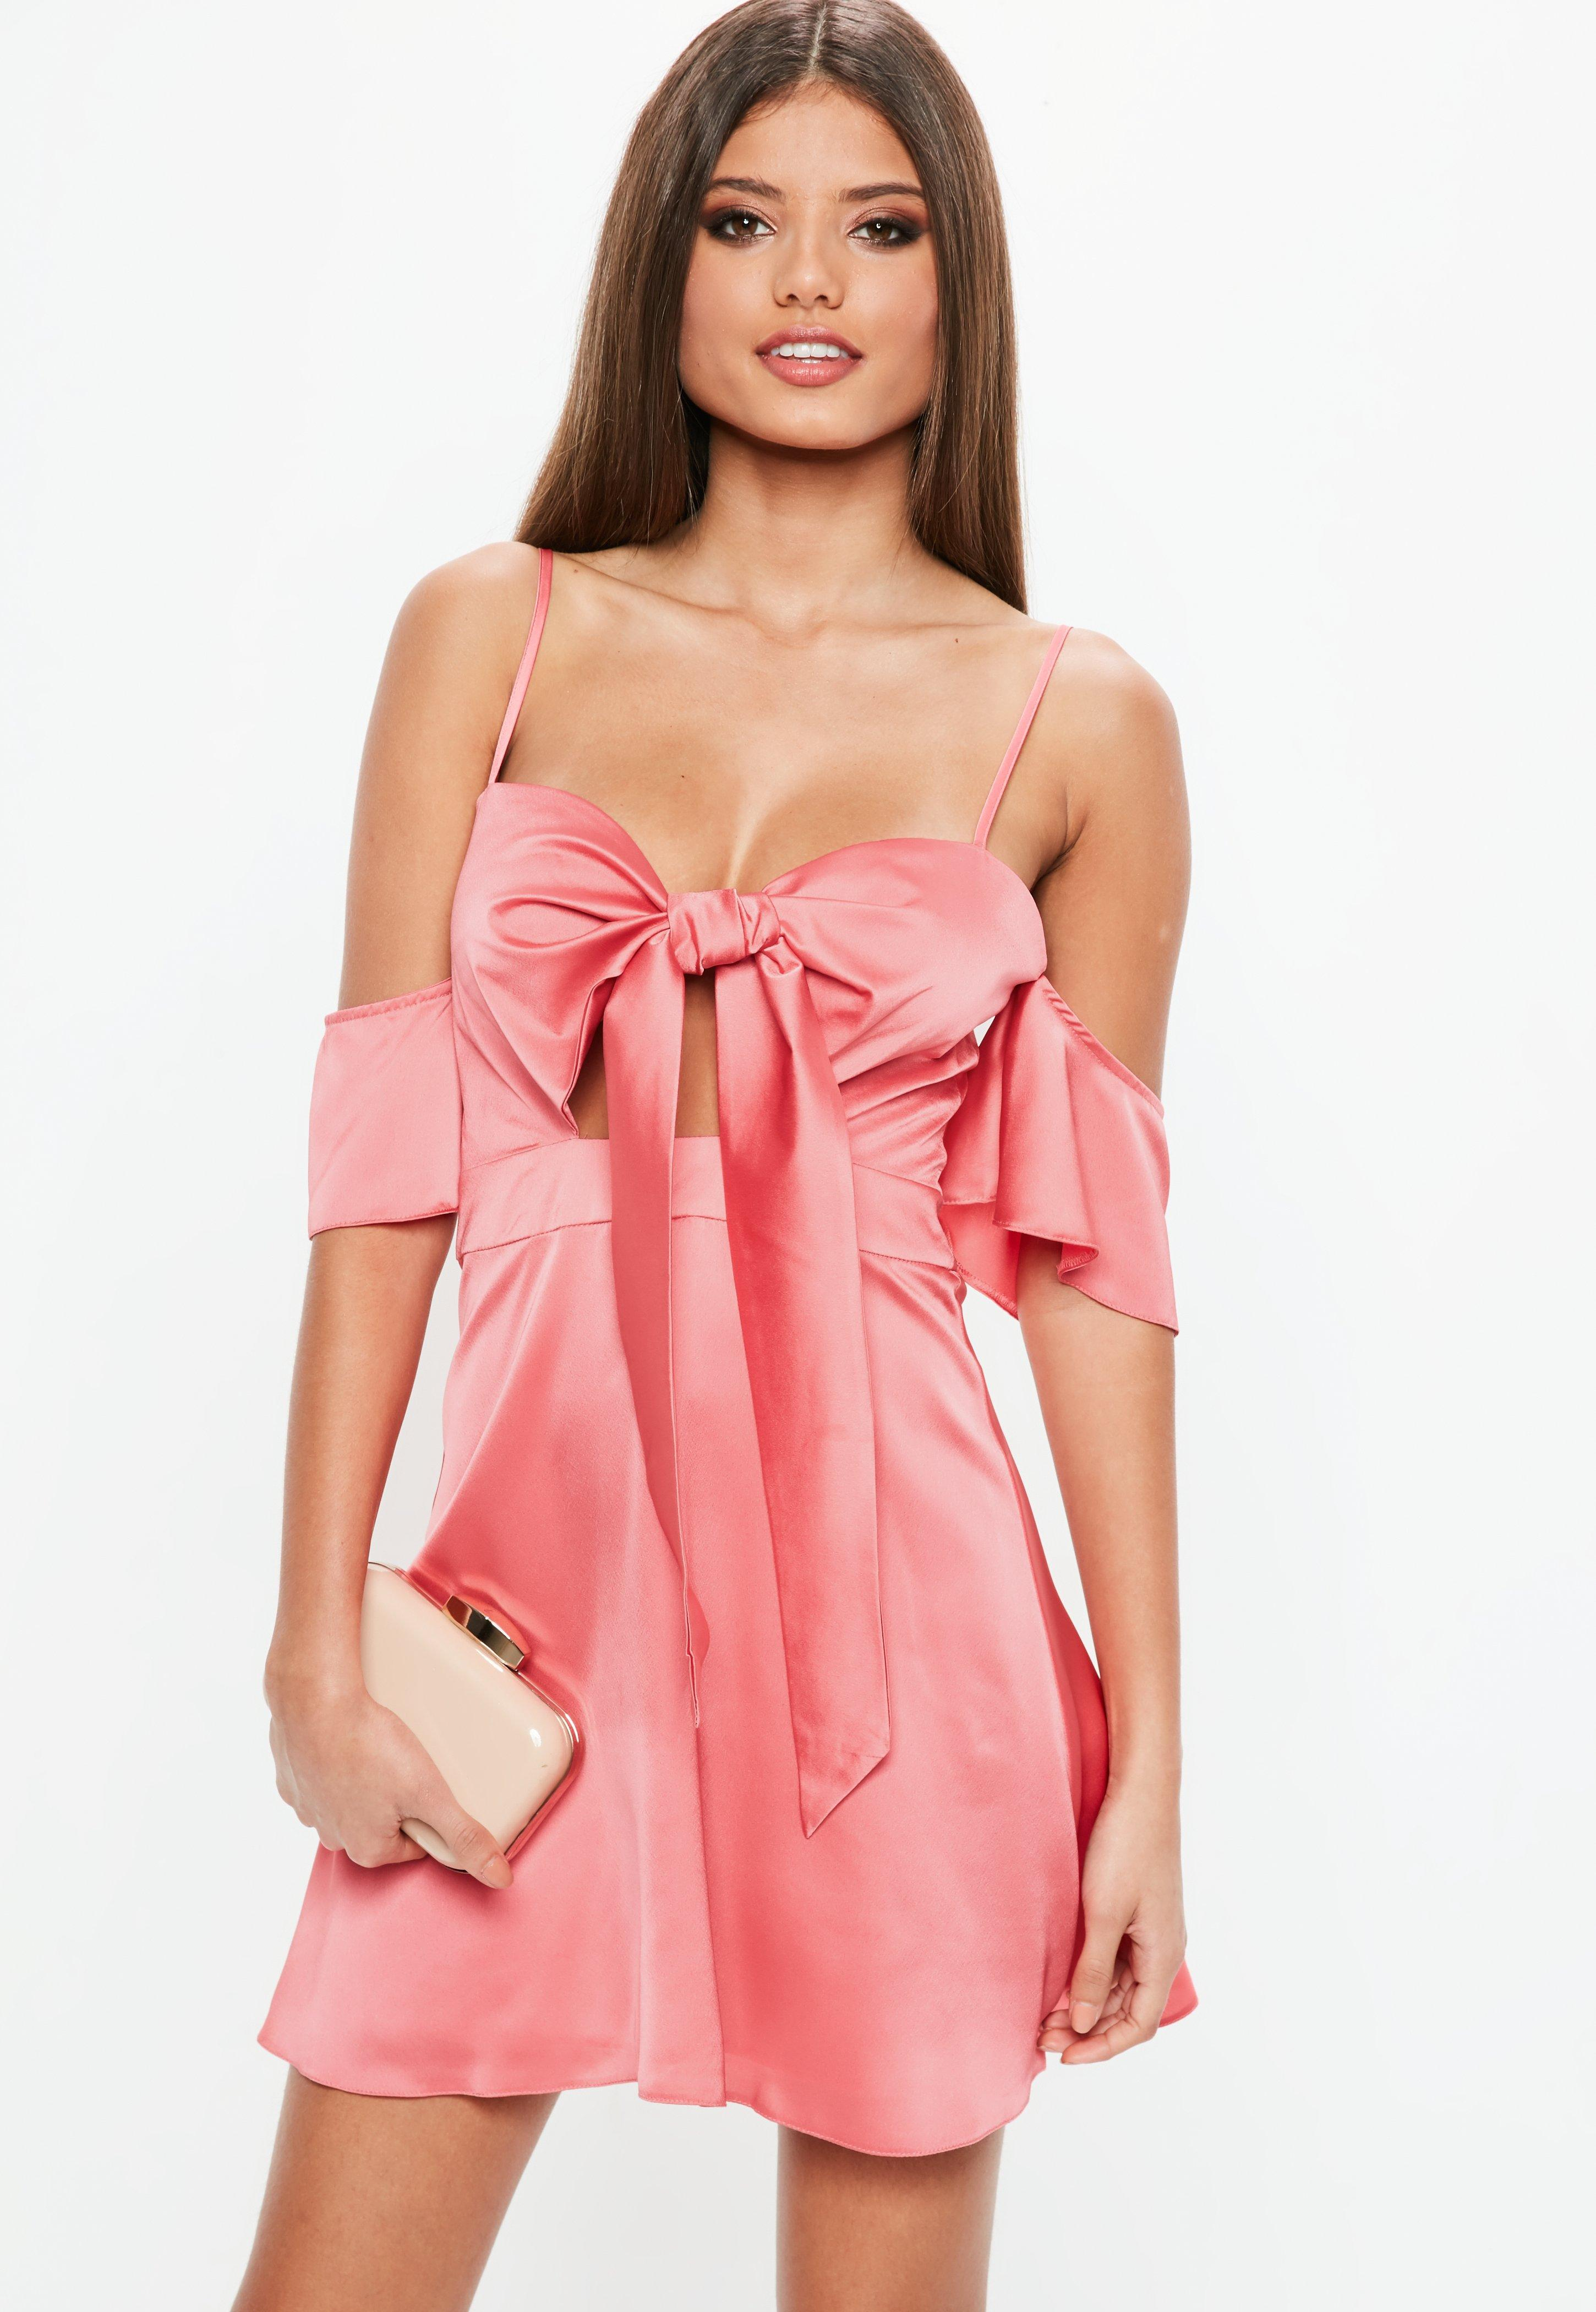 Vestidos de satén | Comprar vestidos de satén online - Missguided